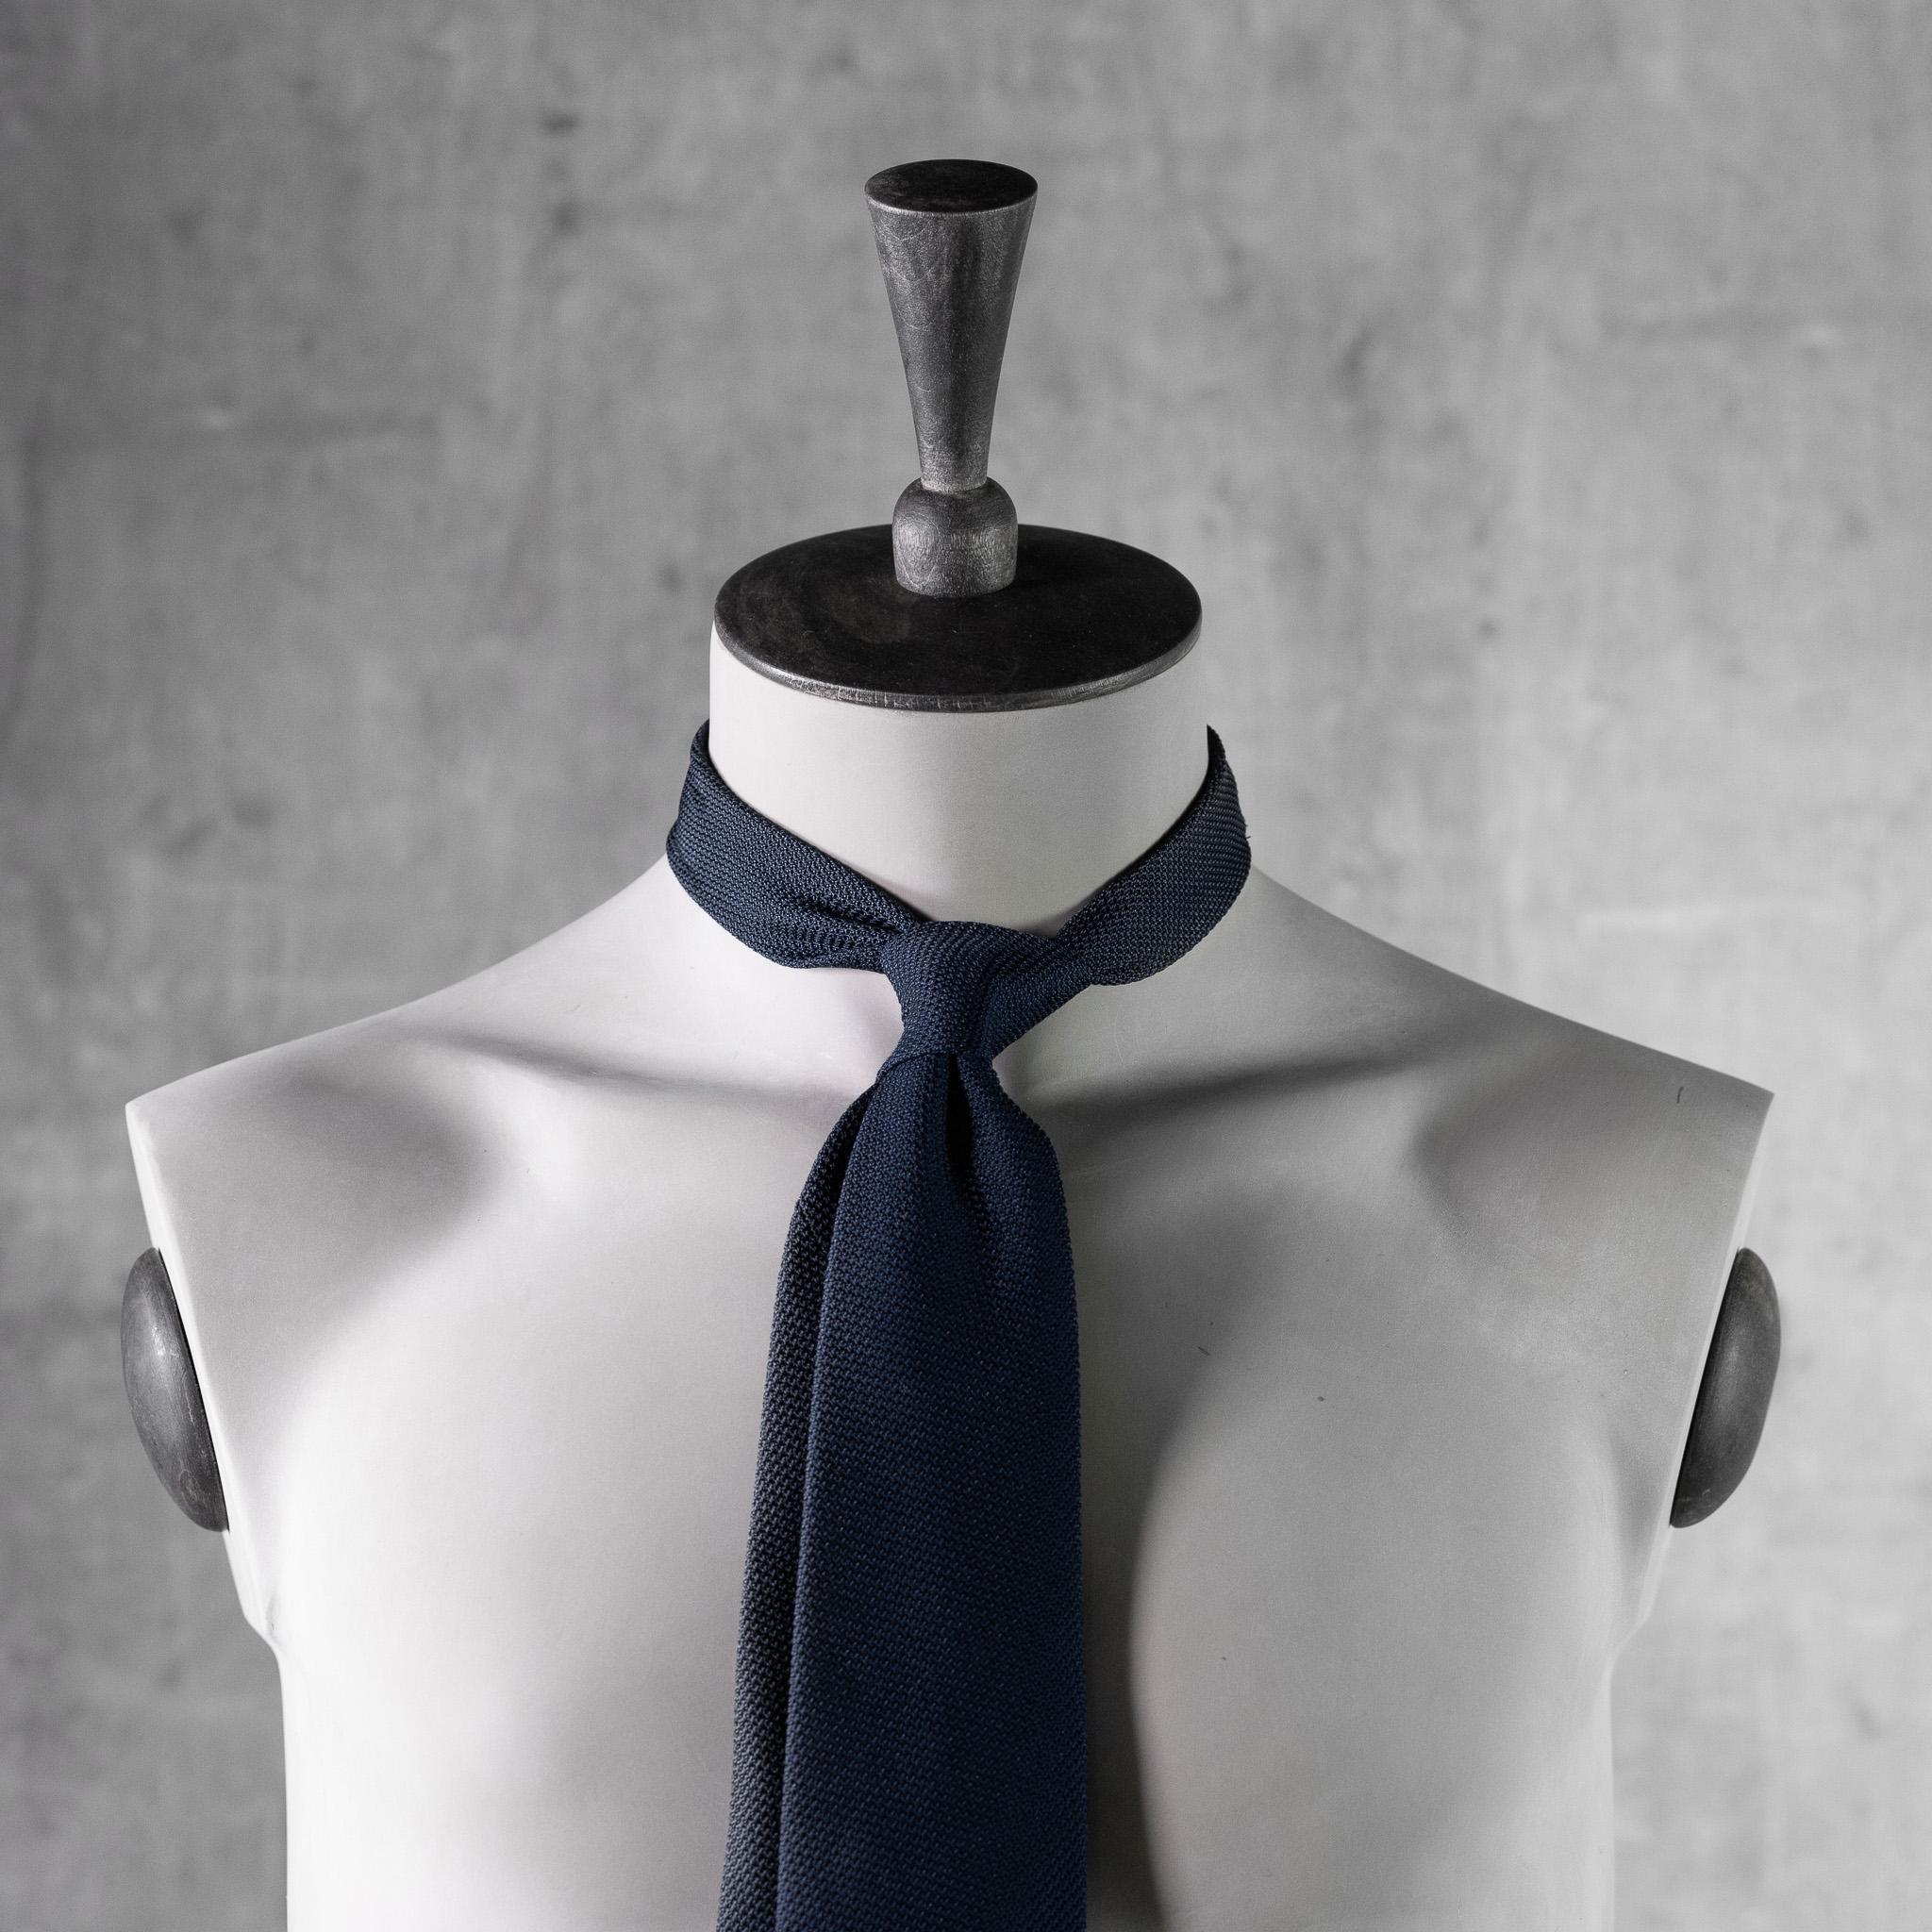 GRENADINE-0509-Tie-Initials-Corbata-Iniciales-The-Seelk-4